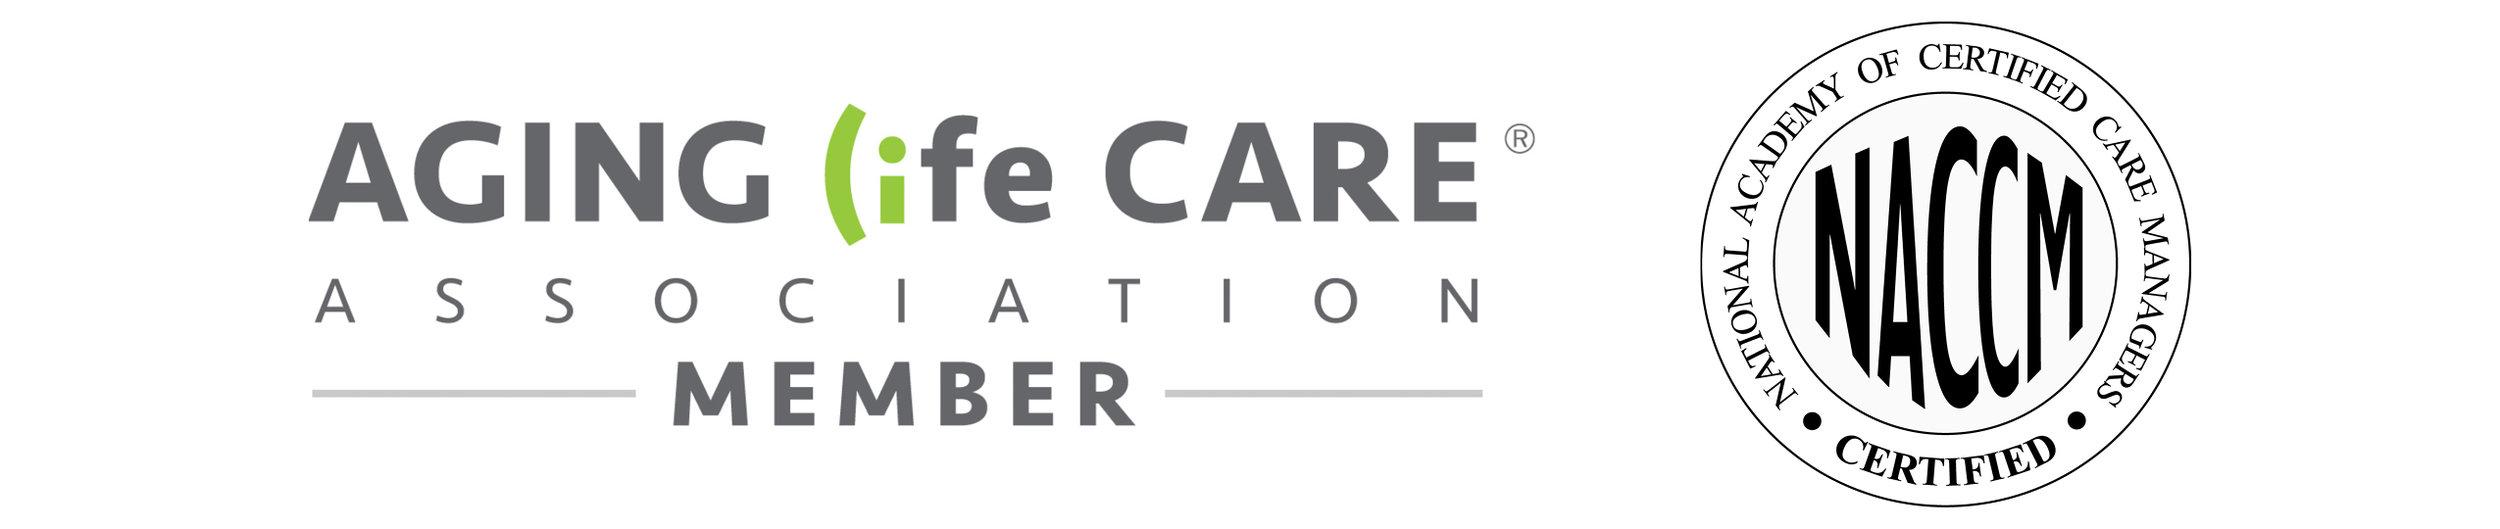 lifecare logos.jpg